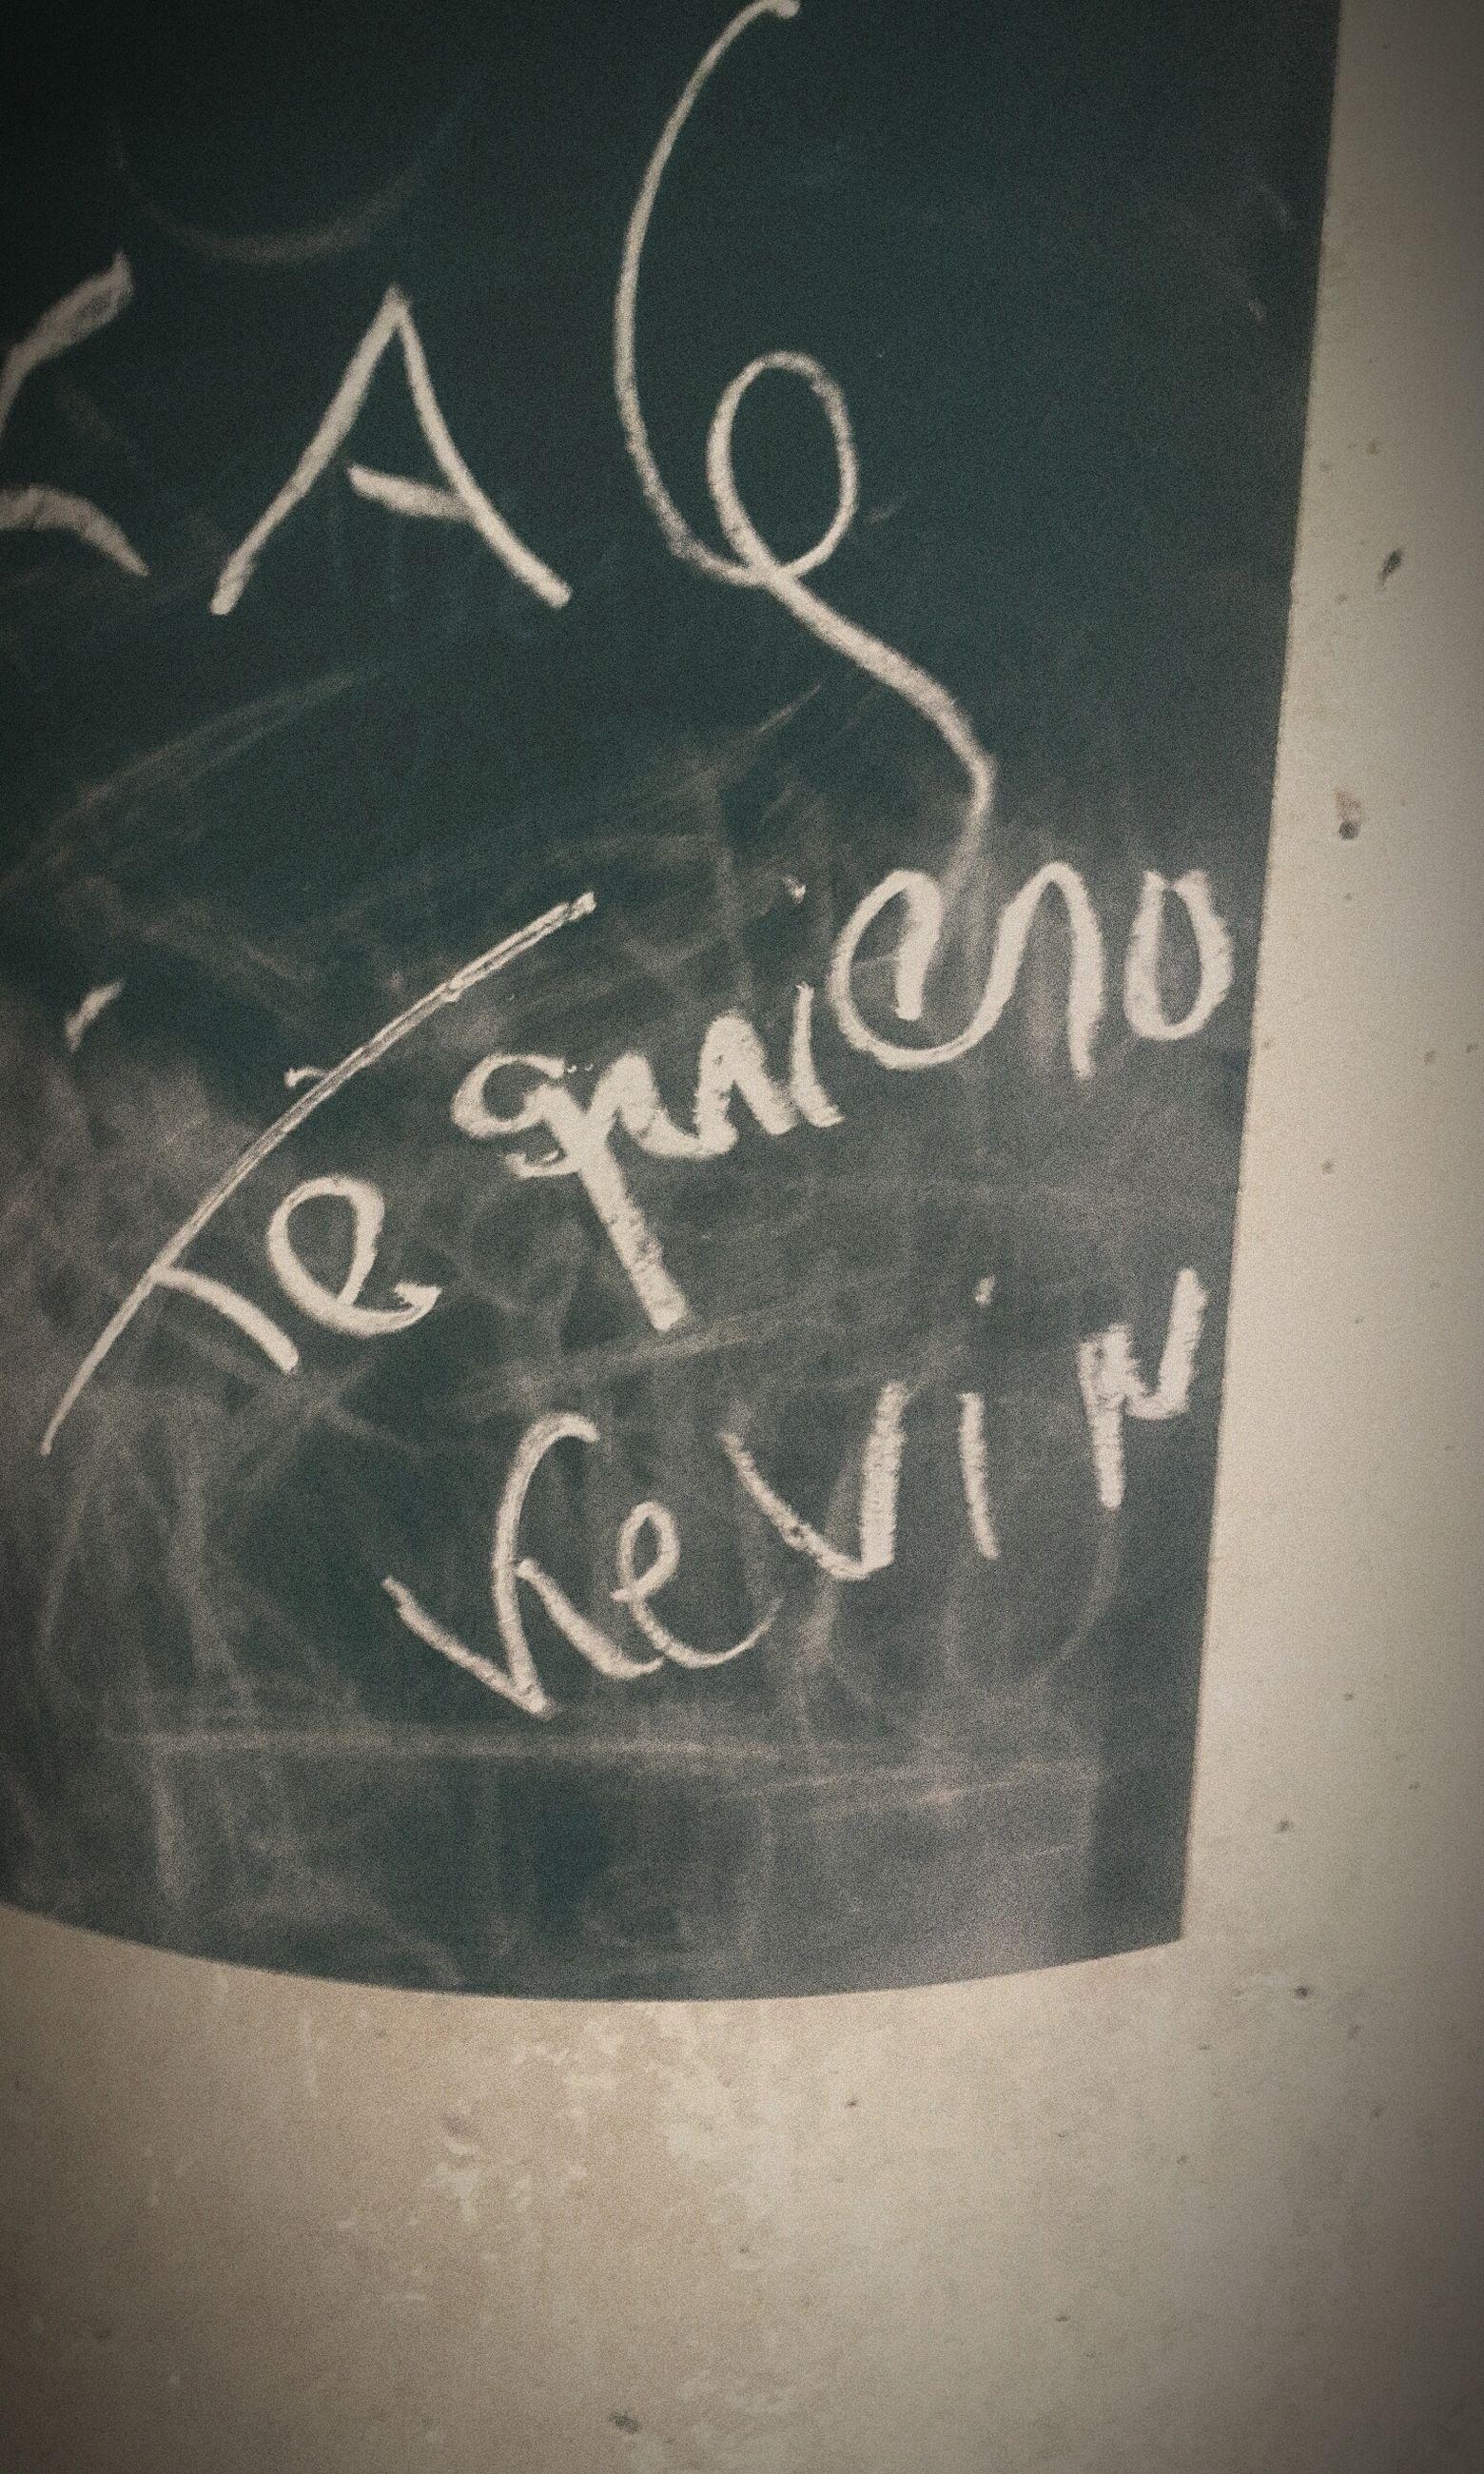 text, western script, communication, capital letter, message, close-up, information, indoors, handwriting, sign, art, non-western script, creativity, guidance, love, paper, graffiti, number, heart shape, symbol